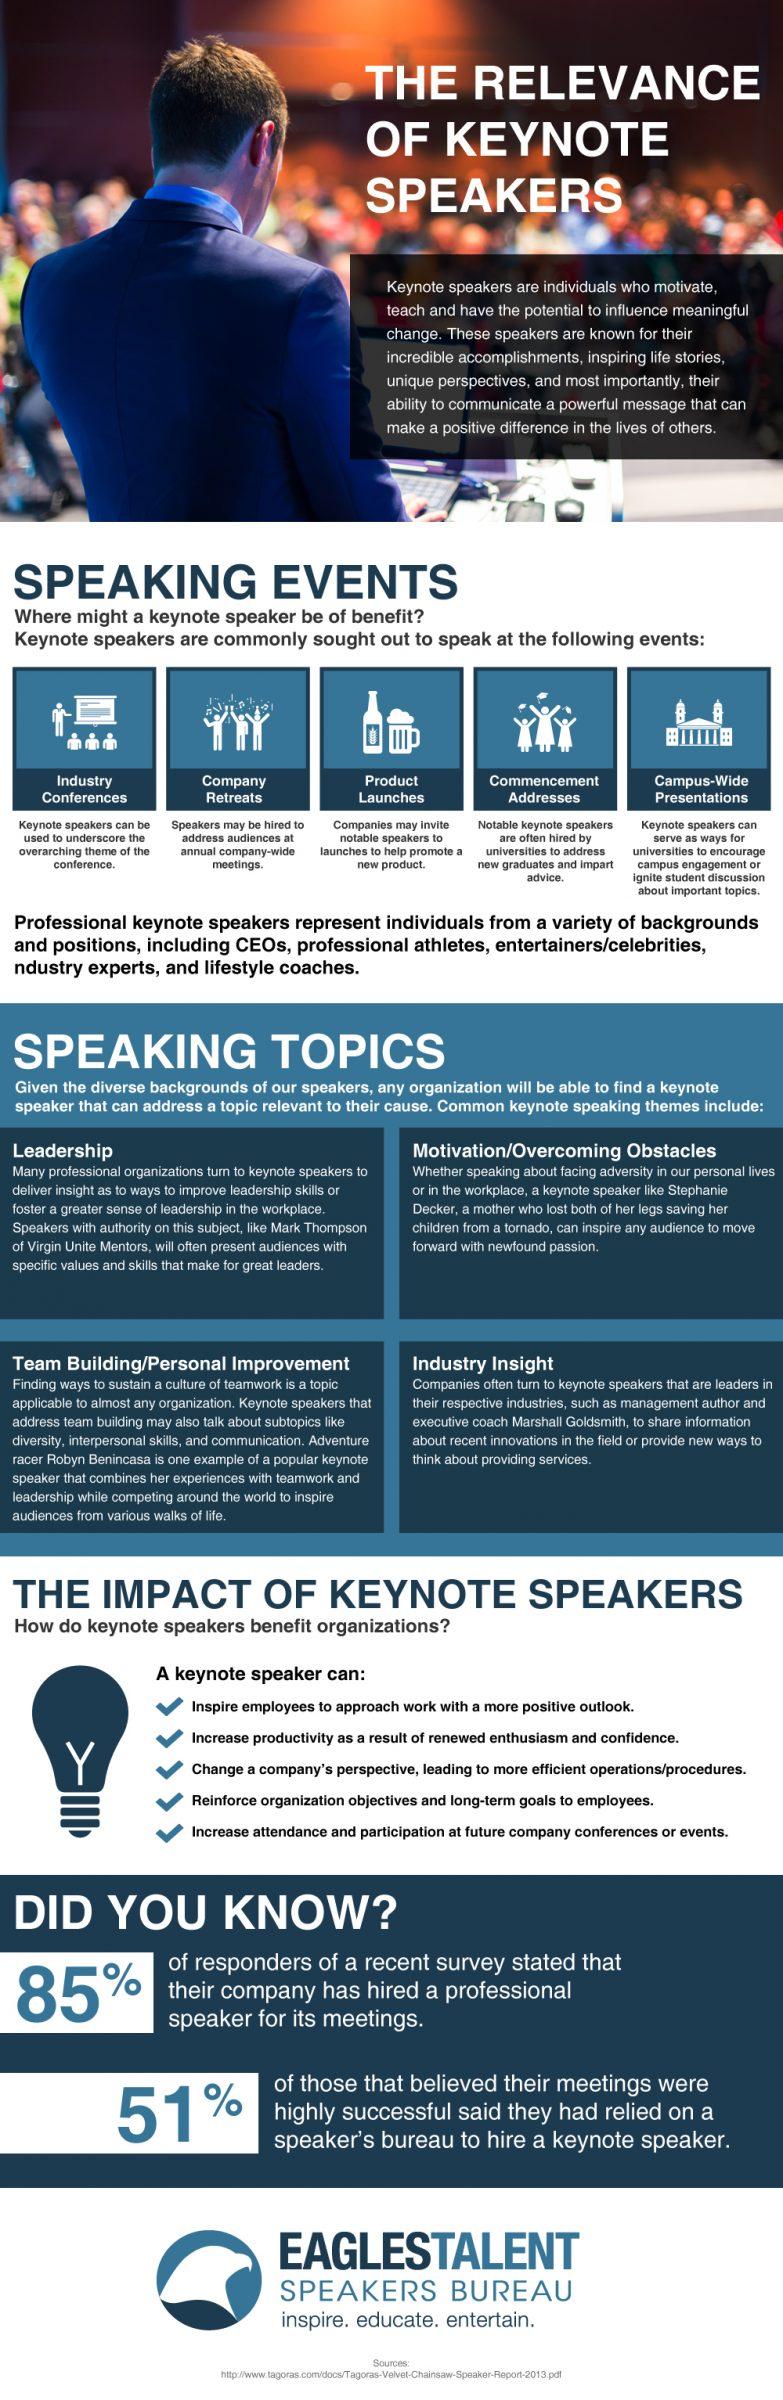 EaglesTalent_Infographic_TheRelevanceOfKeynoteSpeakers